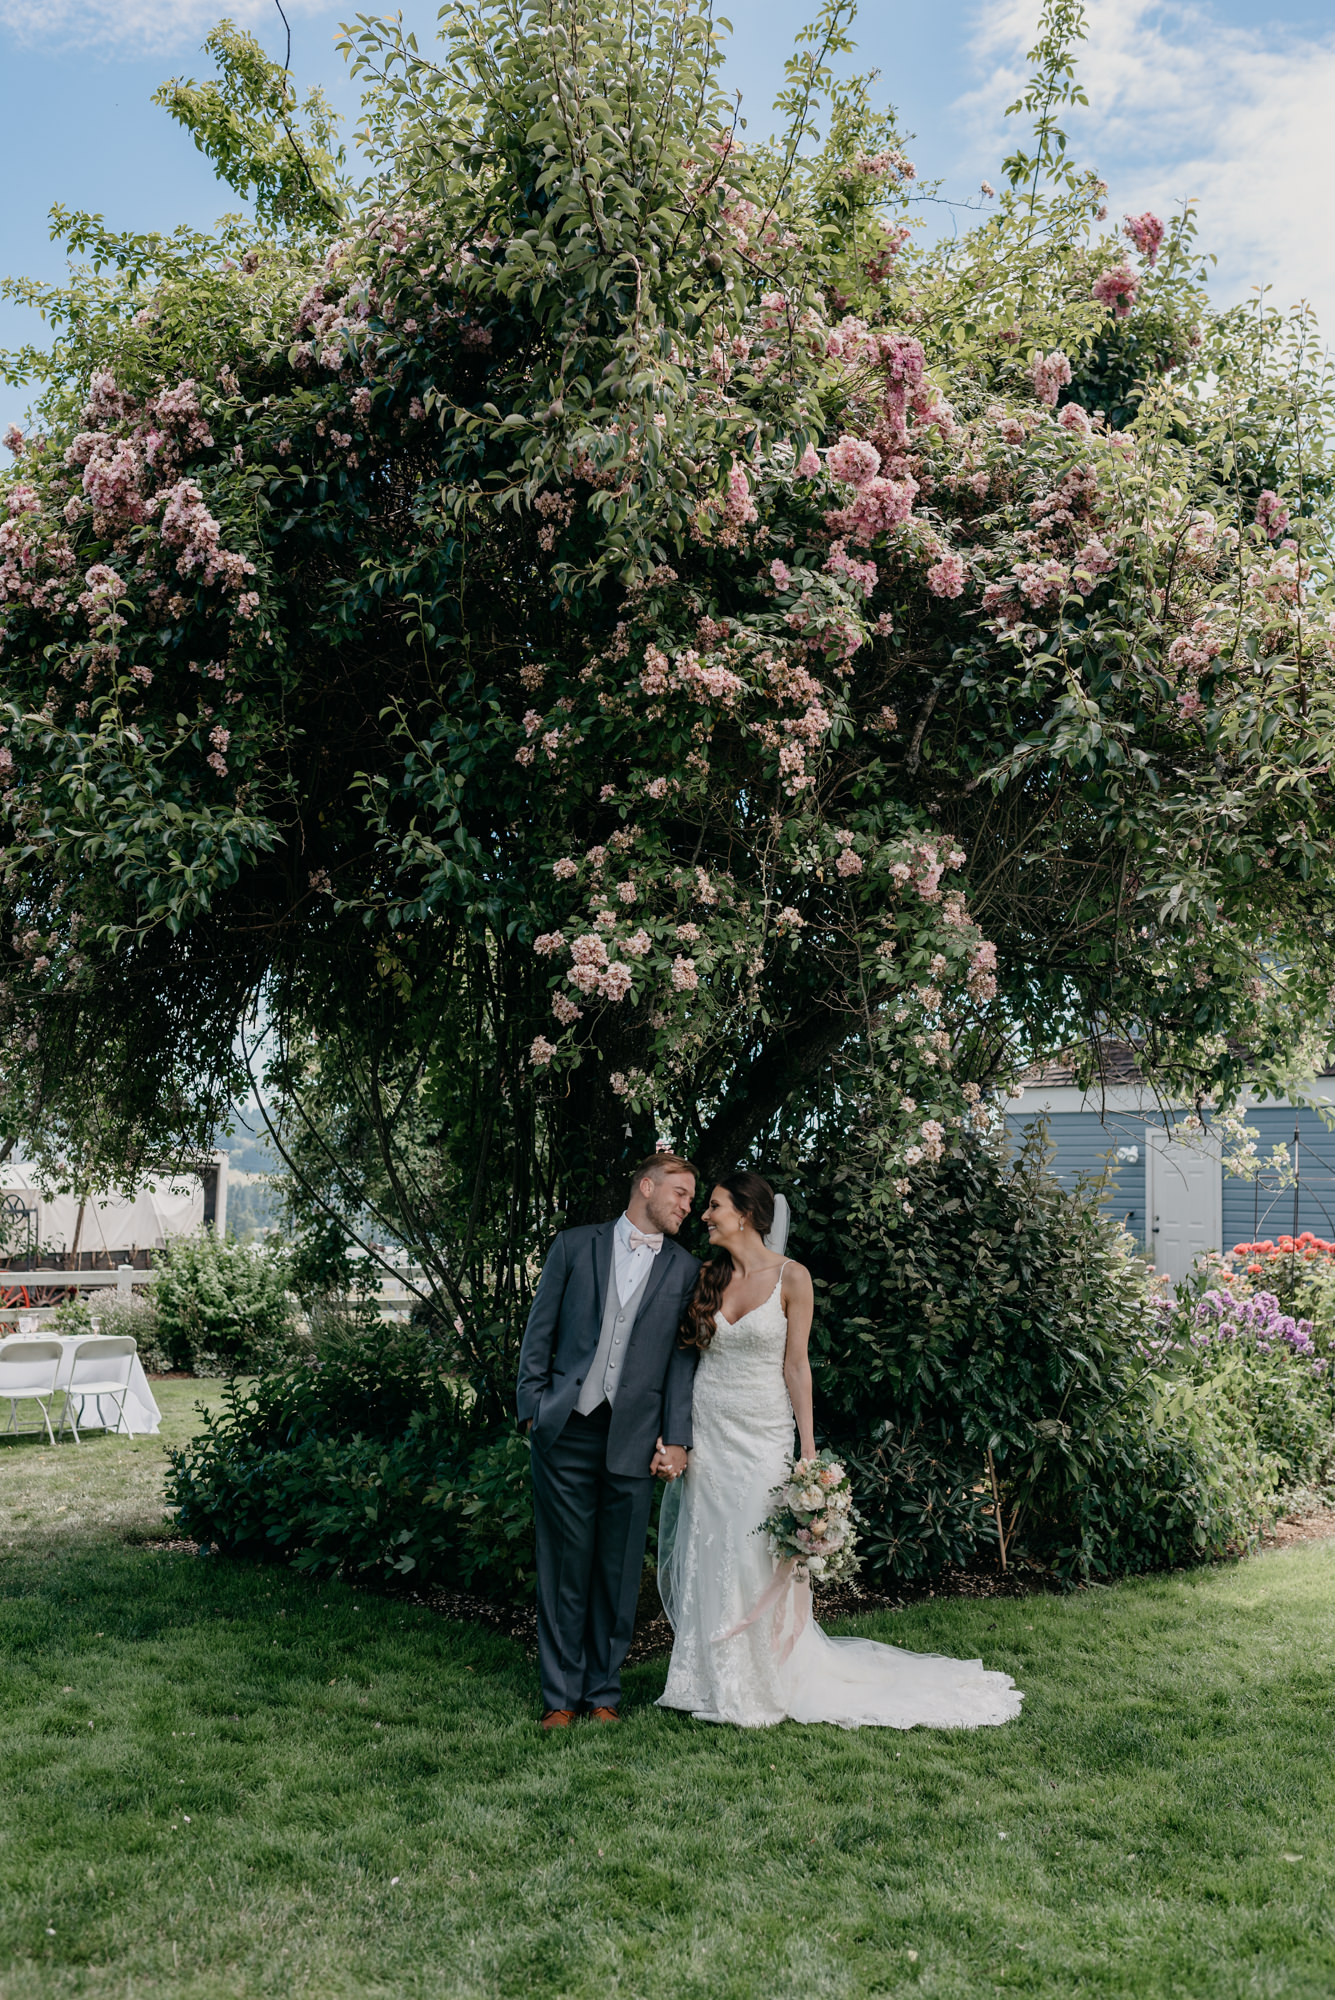 84-lake-oswego-wedding-portland-couple-rose-tree.jpg